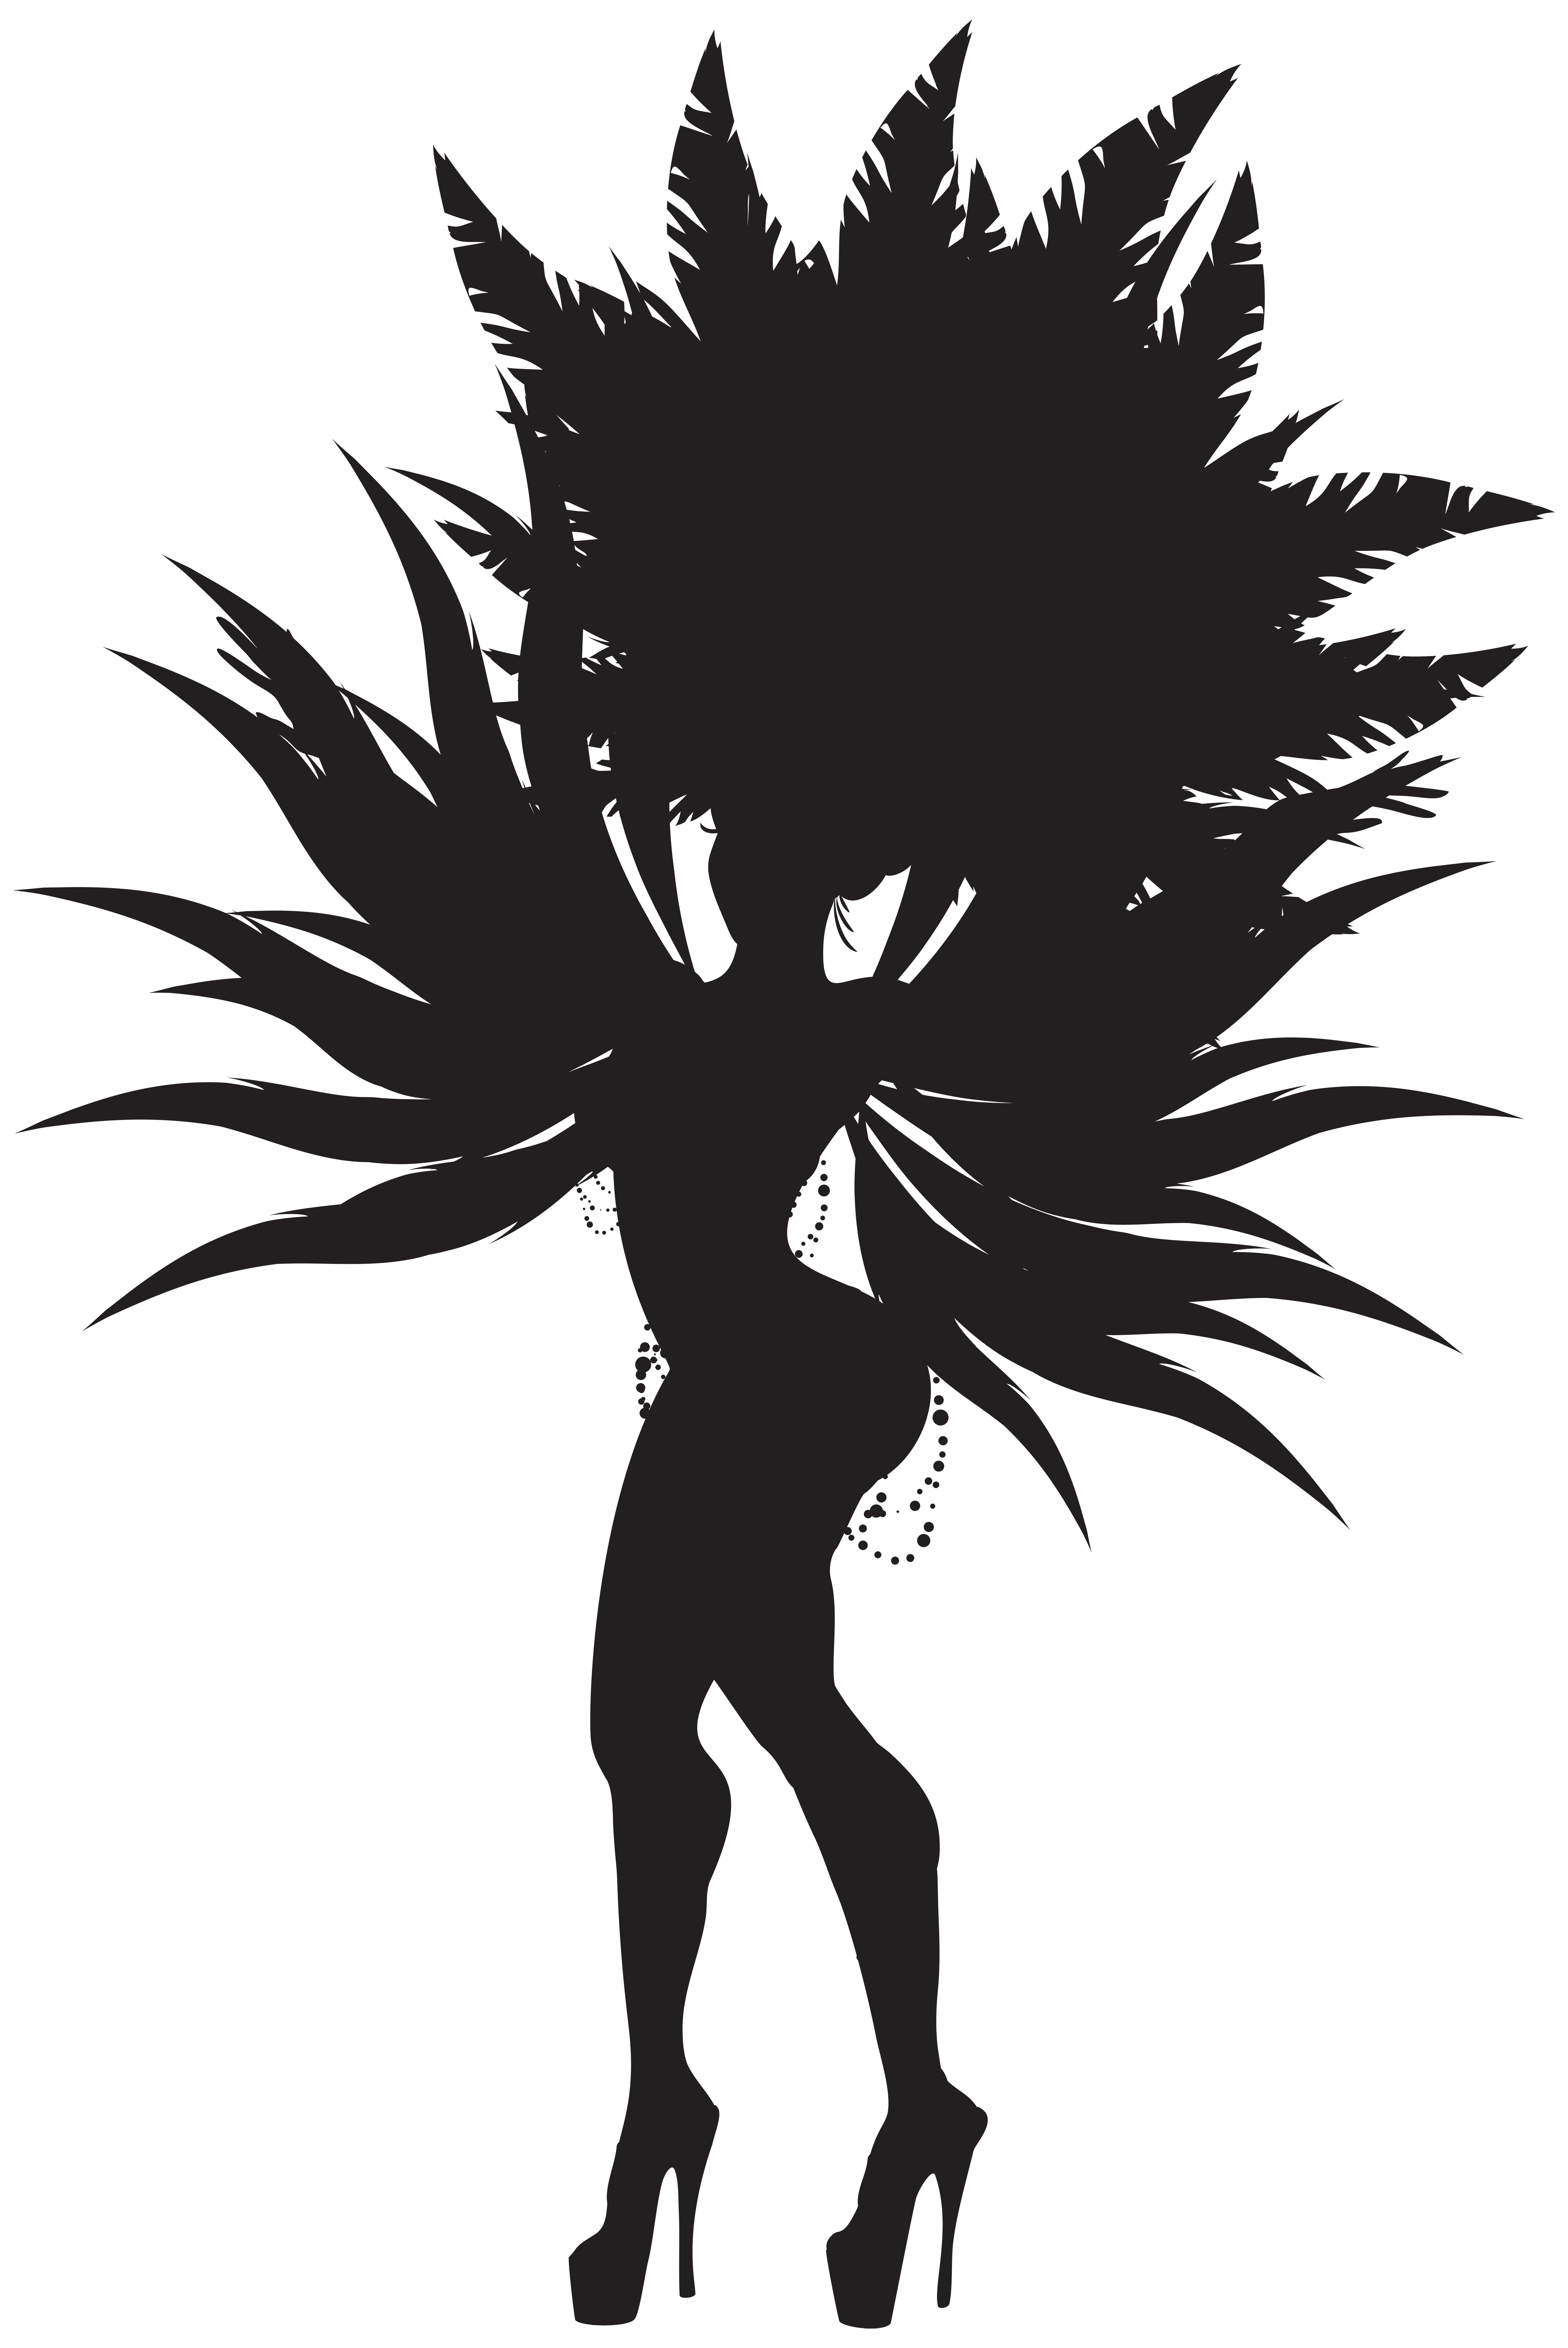 Brazilian samba dancer png. Lake clipart silhouette